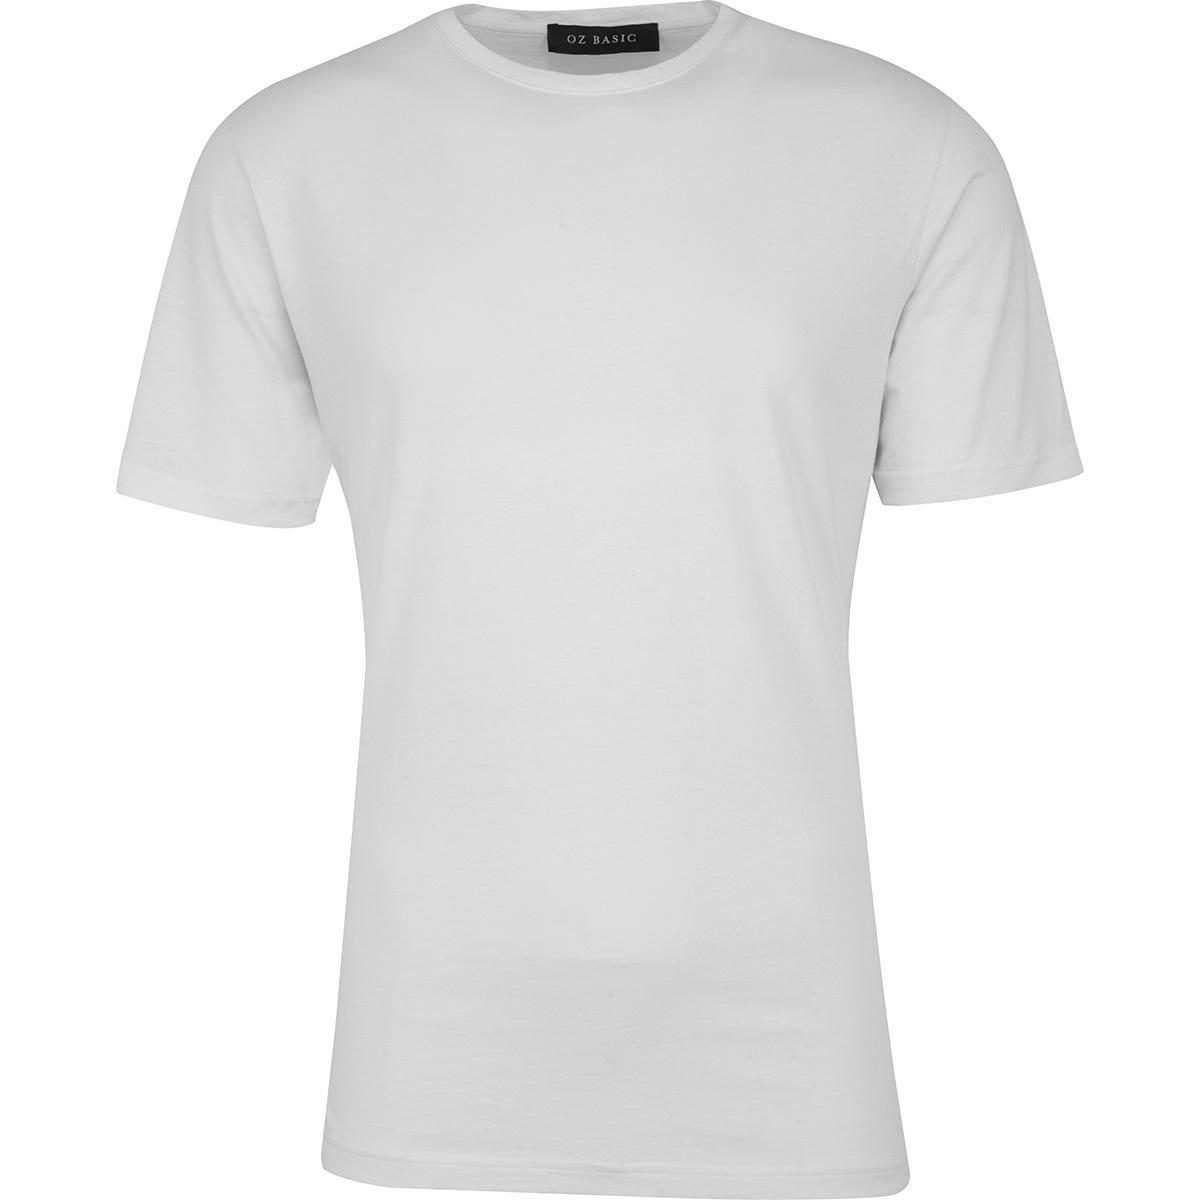 T-Shirt Manica Corta